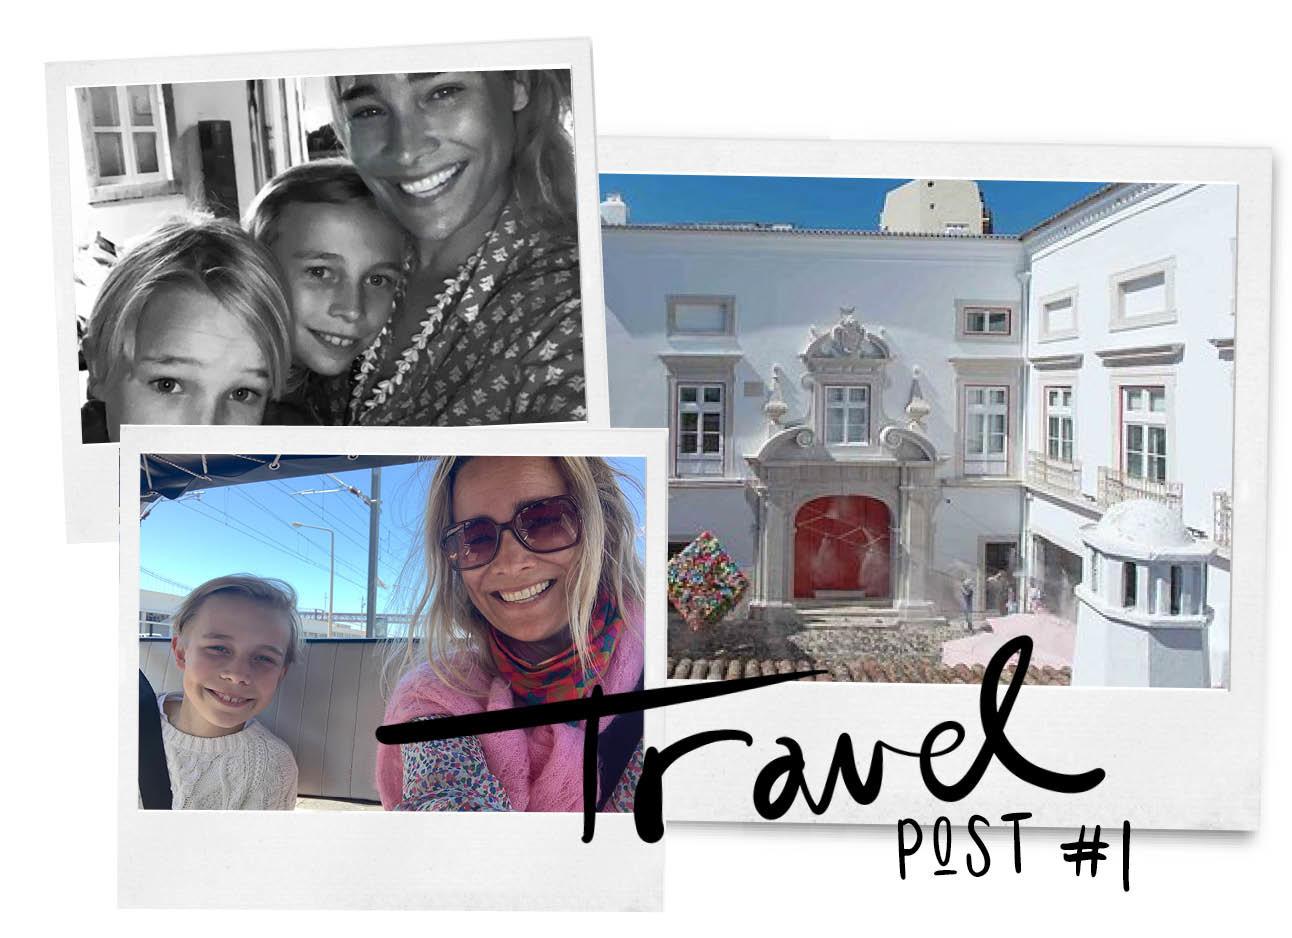 jetteke van lexmond reist door portugal met haar twee zoons dean en june